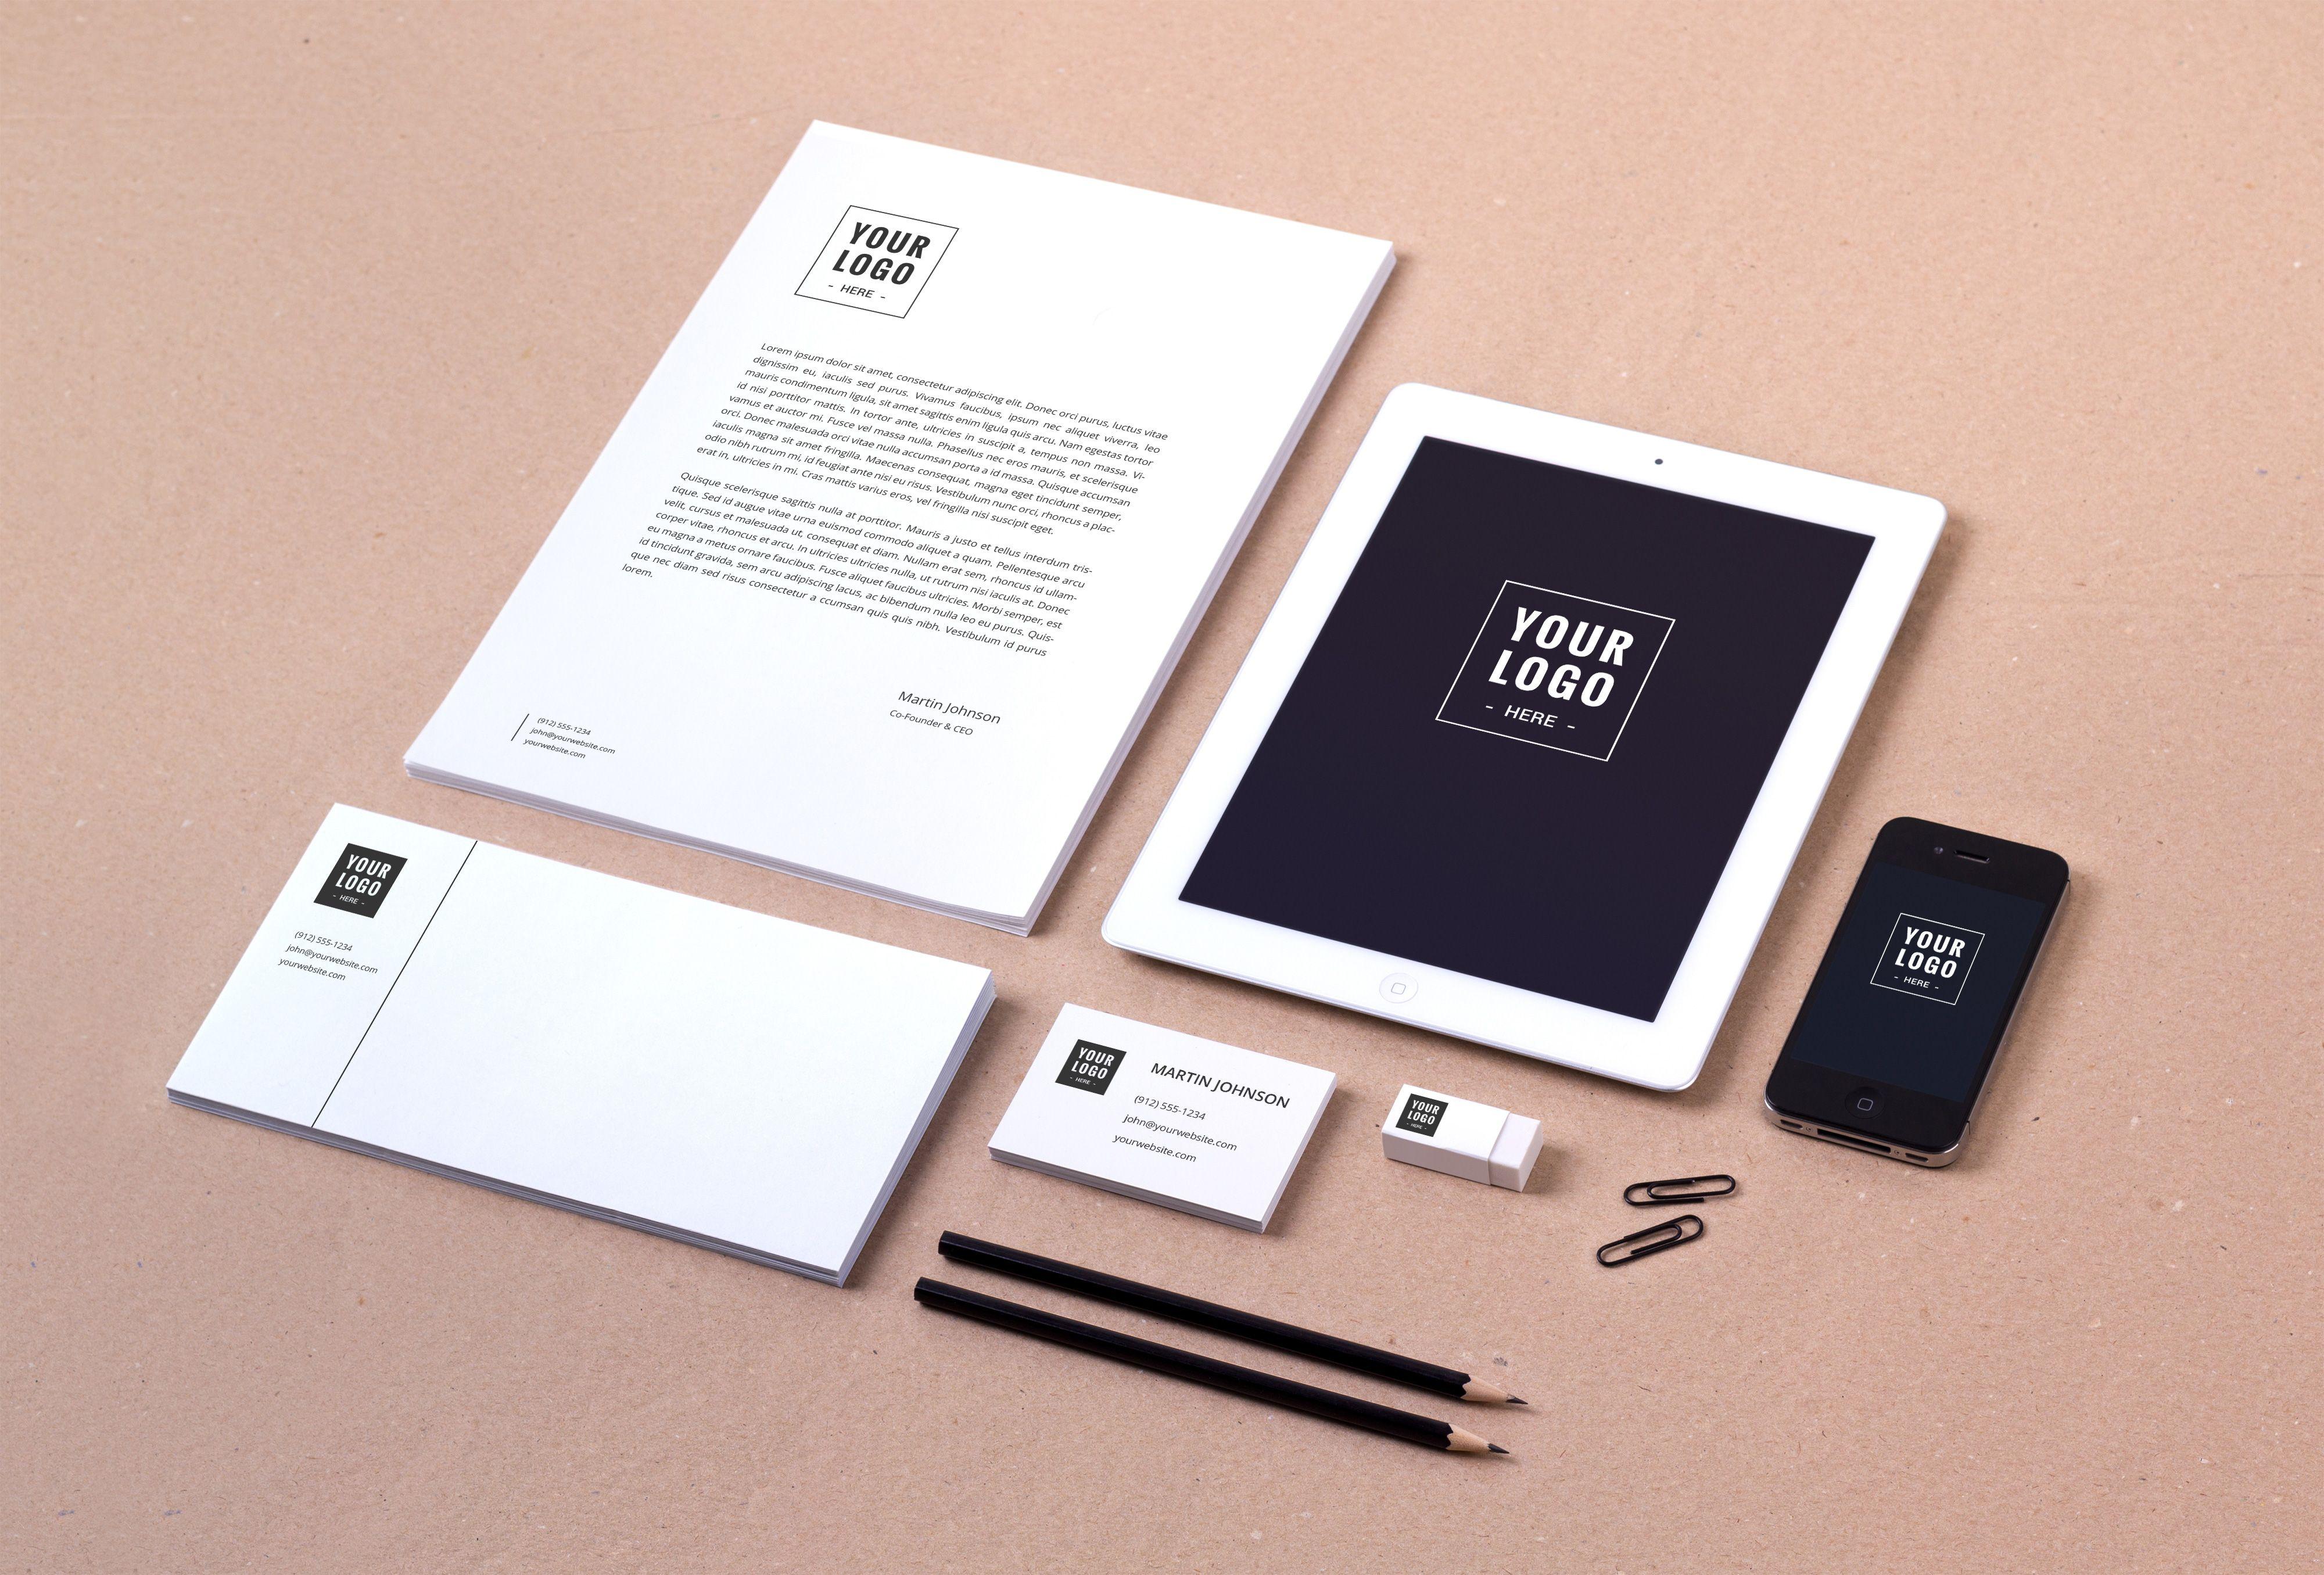 Branding Identity Mockup Vol 8 Graphicburger Branding Identity Mockup Branding Mockups Psd Branding Mockups